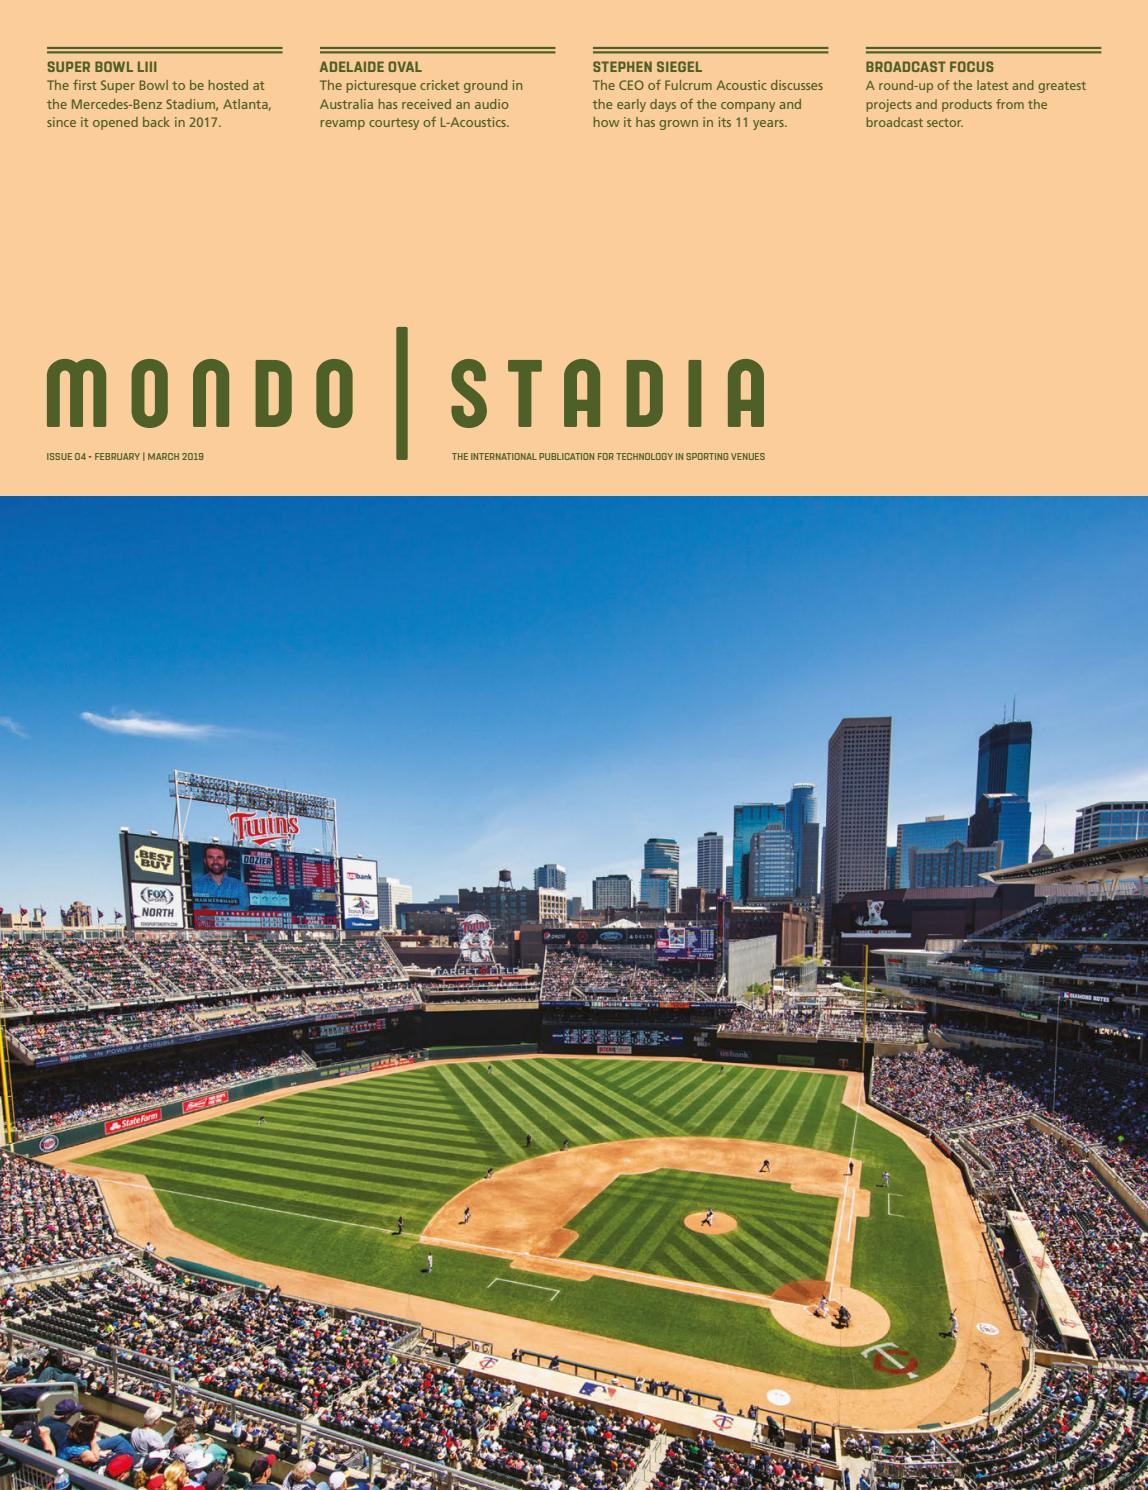 Mondo | Stadia - Issue 04 with regard to Venue Stadium To Do Checklist Template